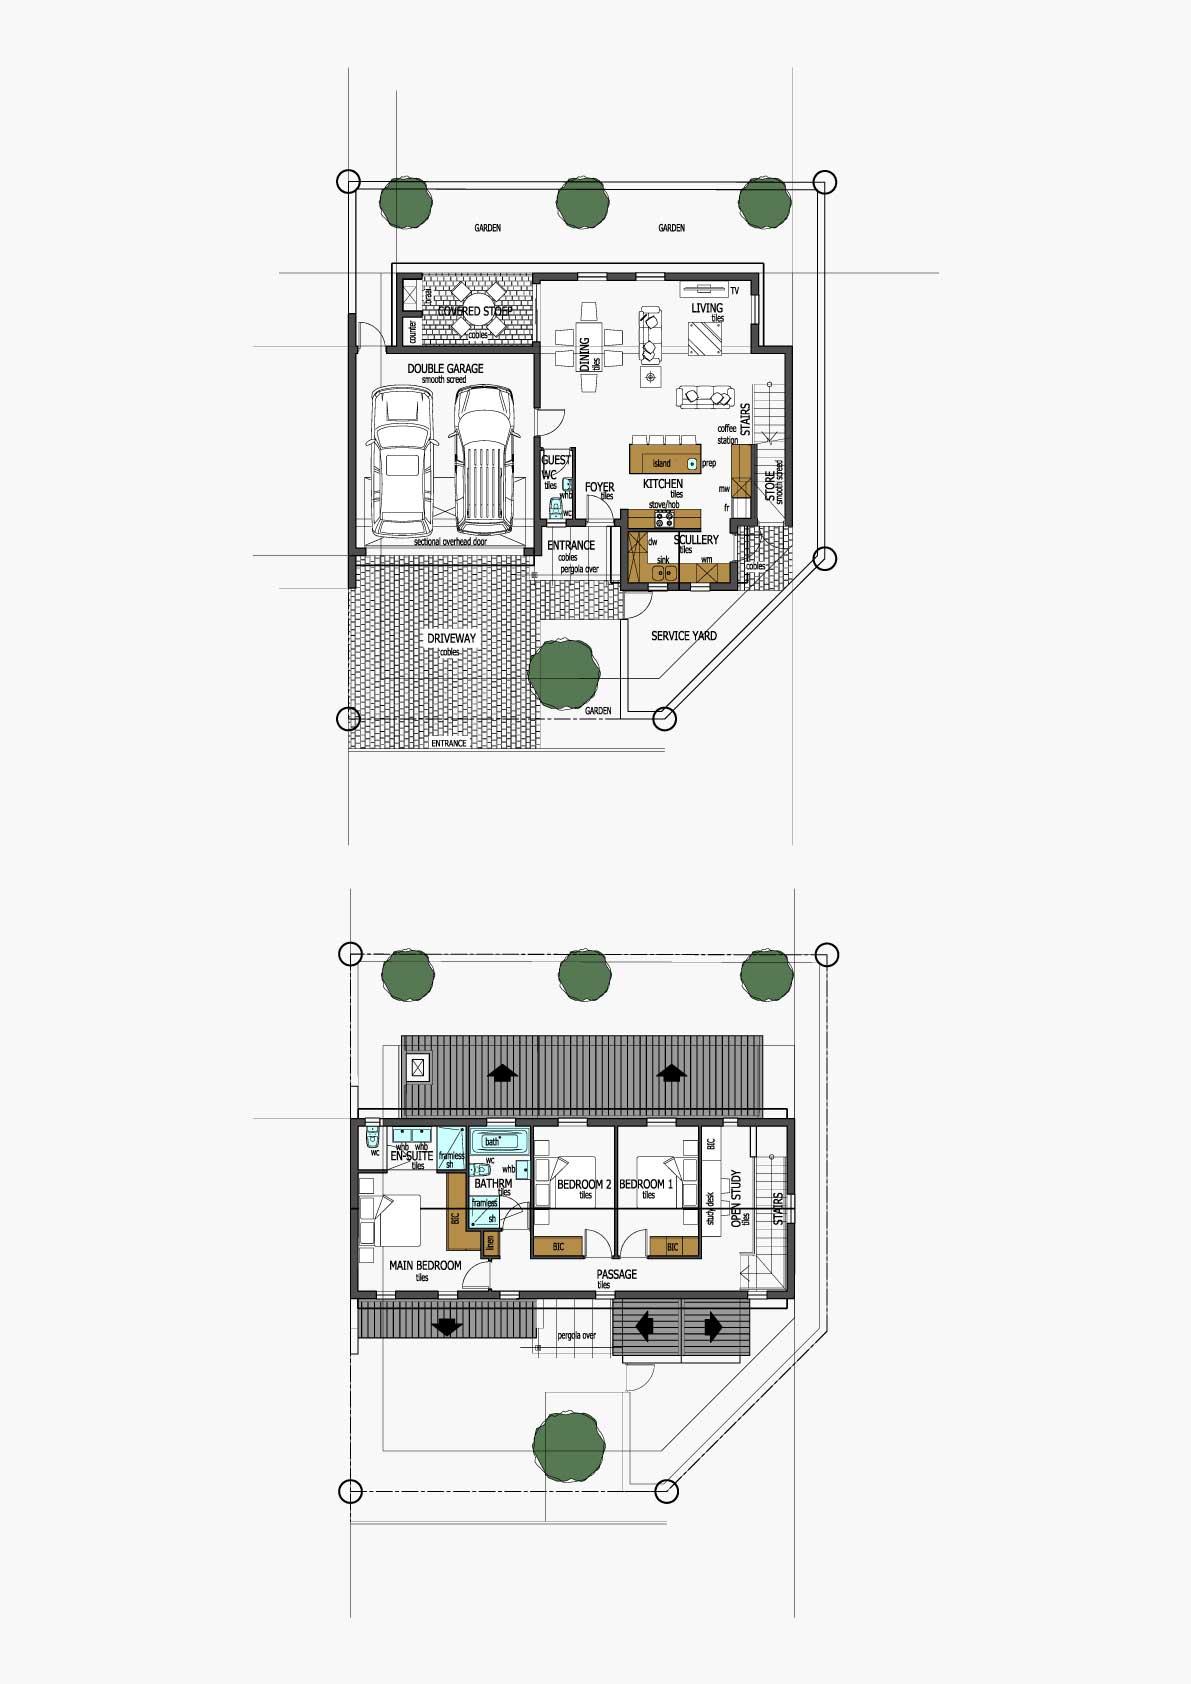 Homes Unit Layout - Type J